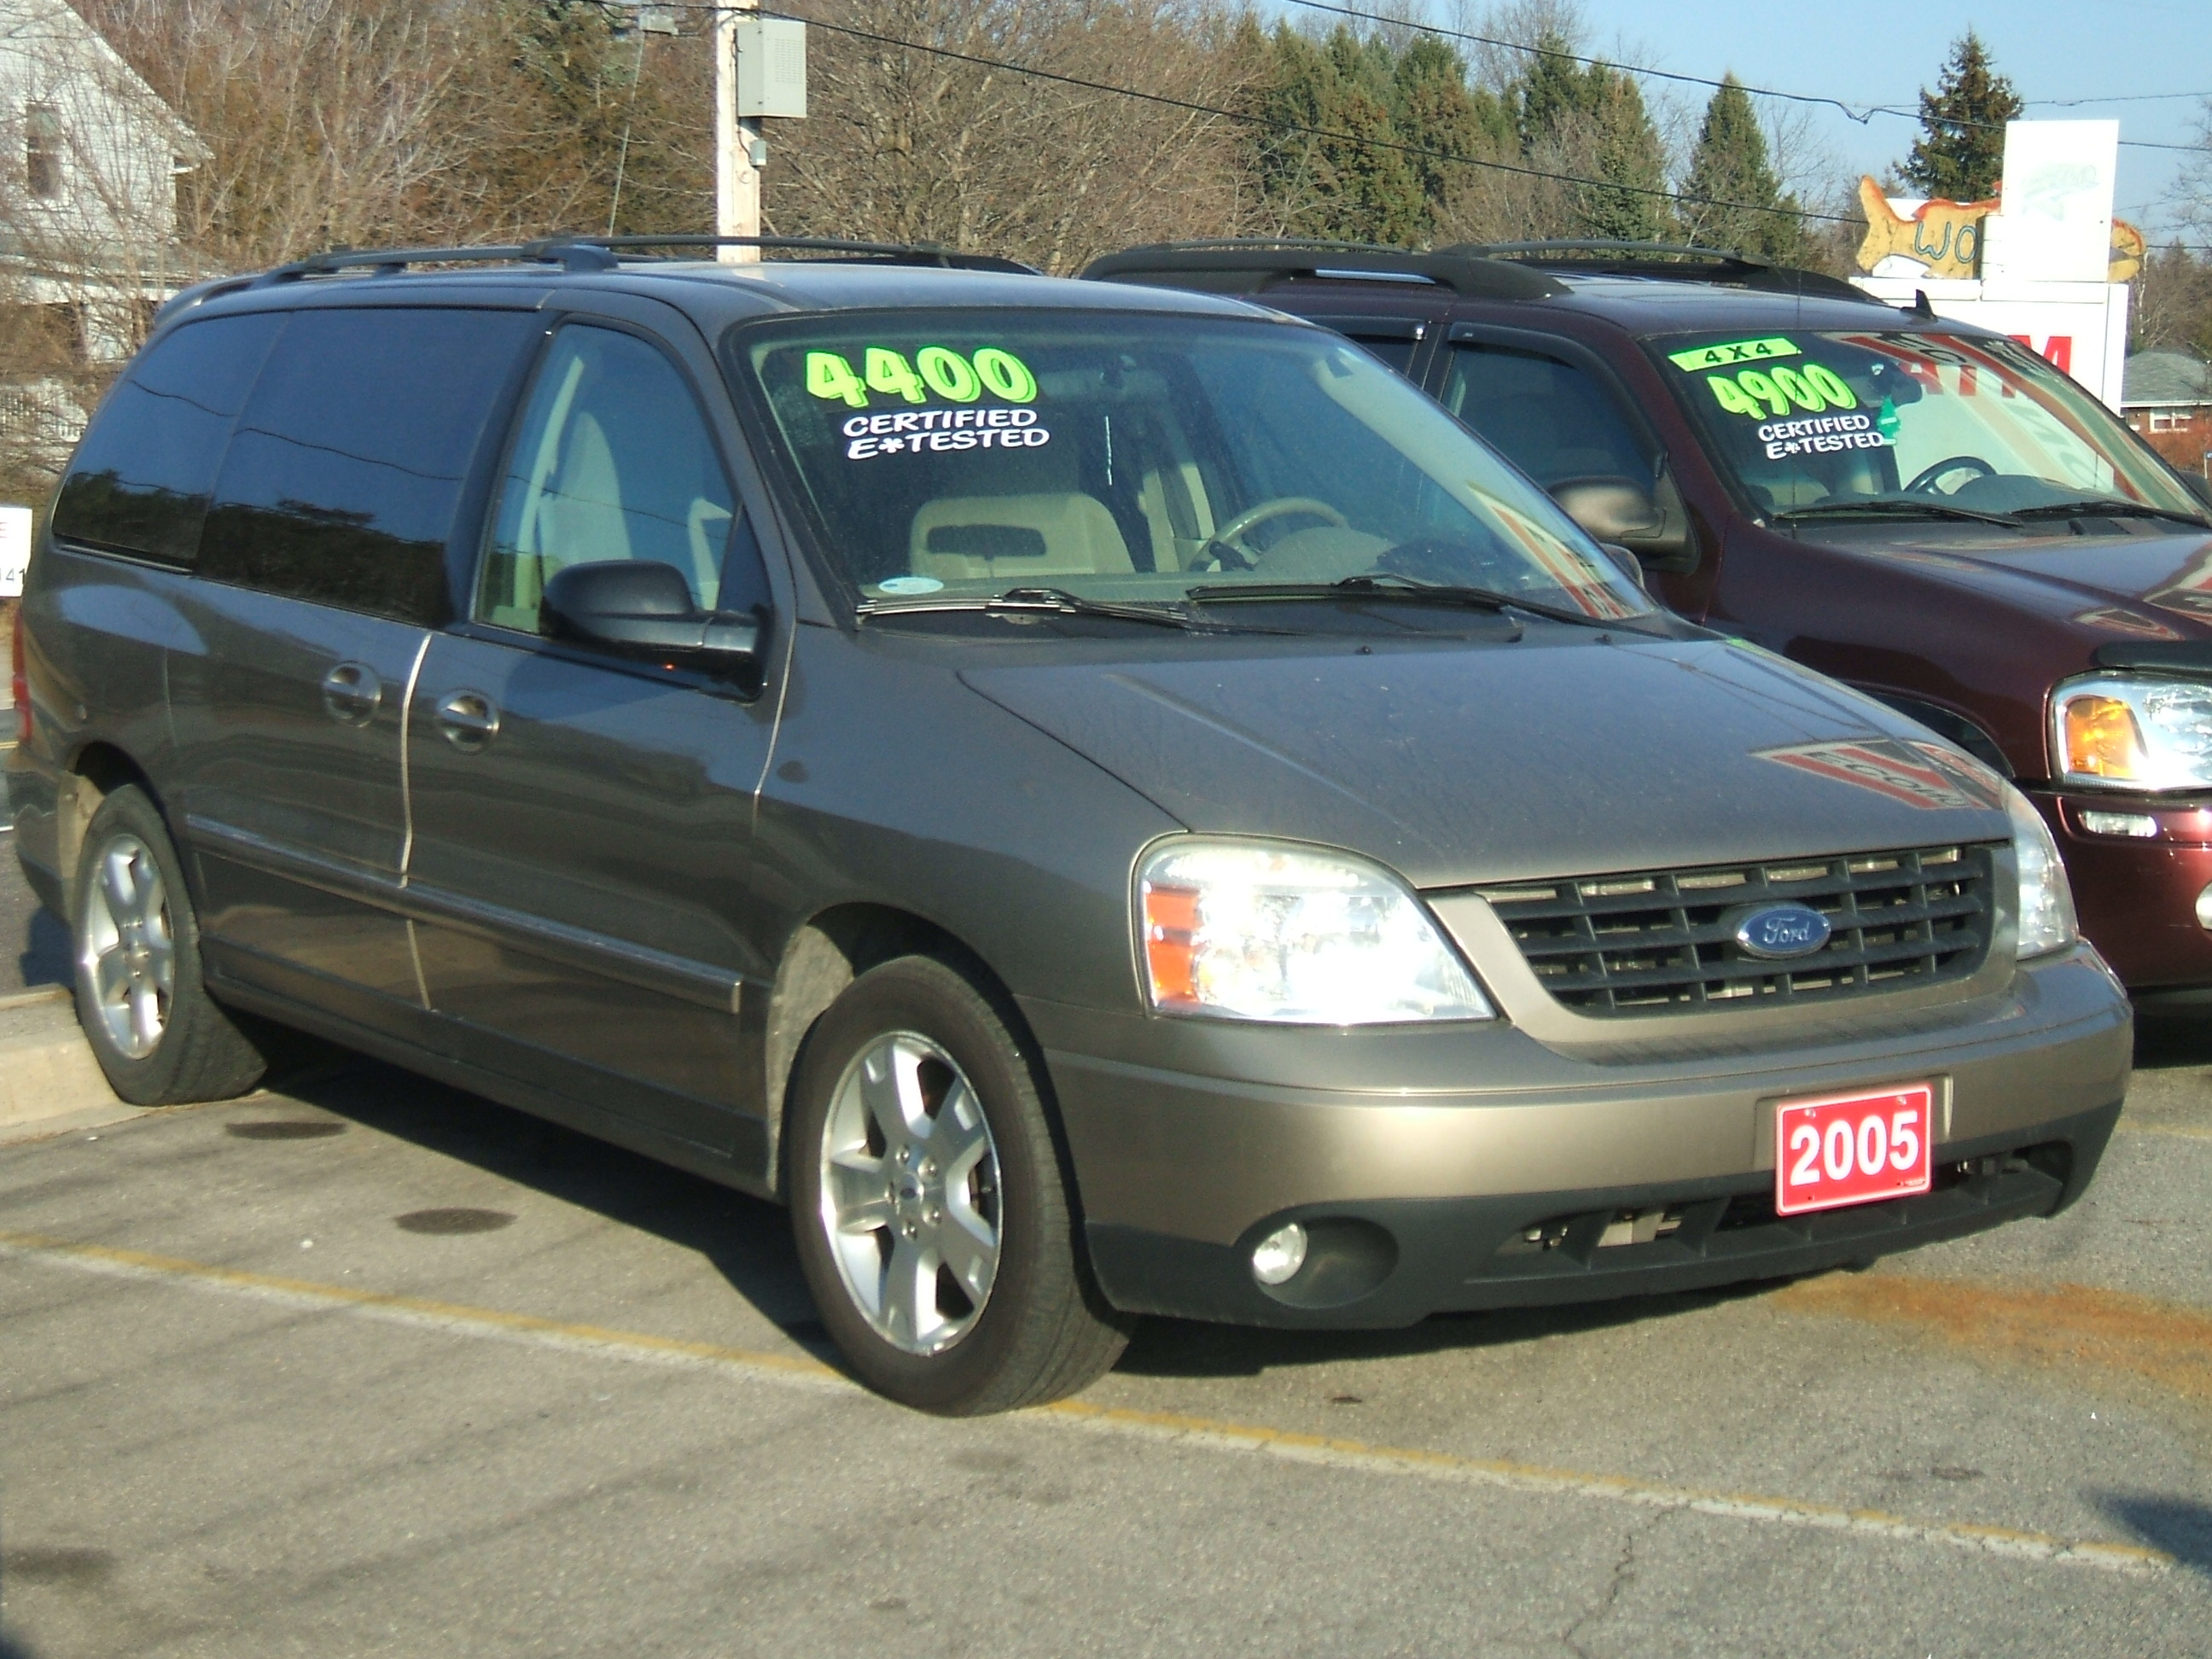 2005 Ford Free Star Ses Van 3